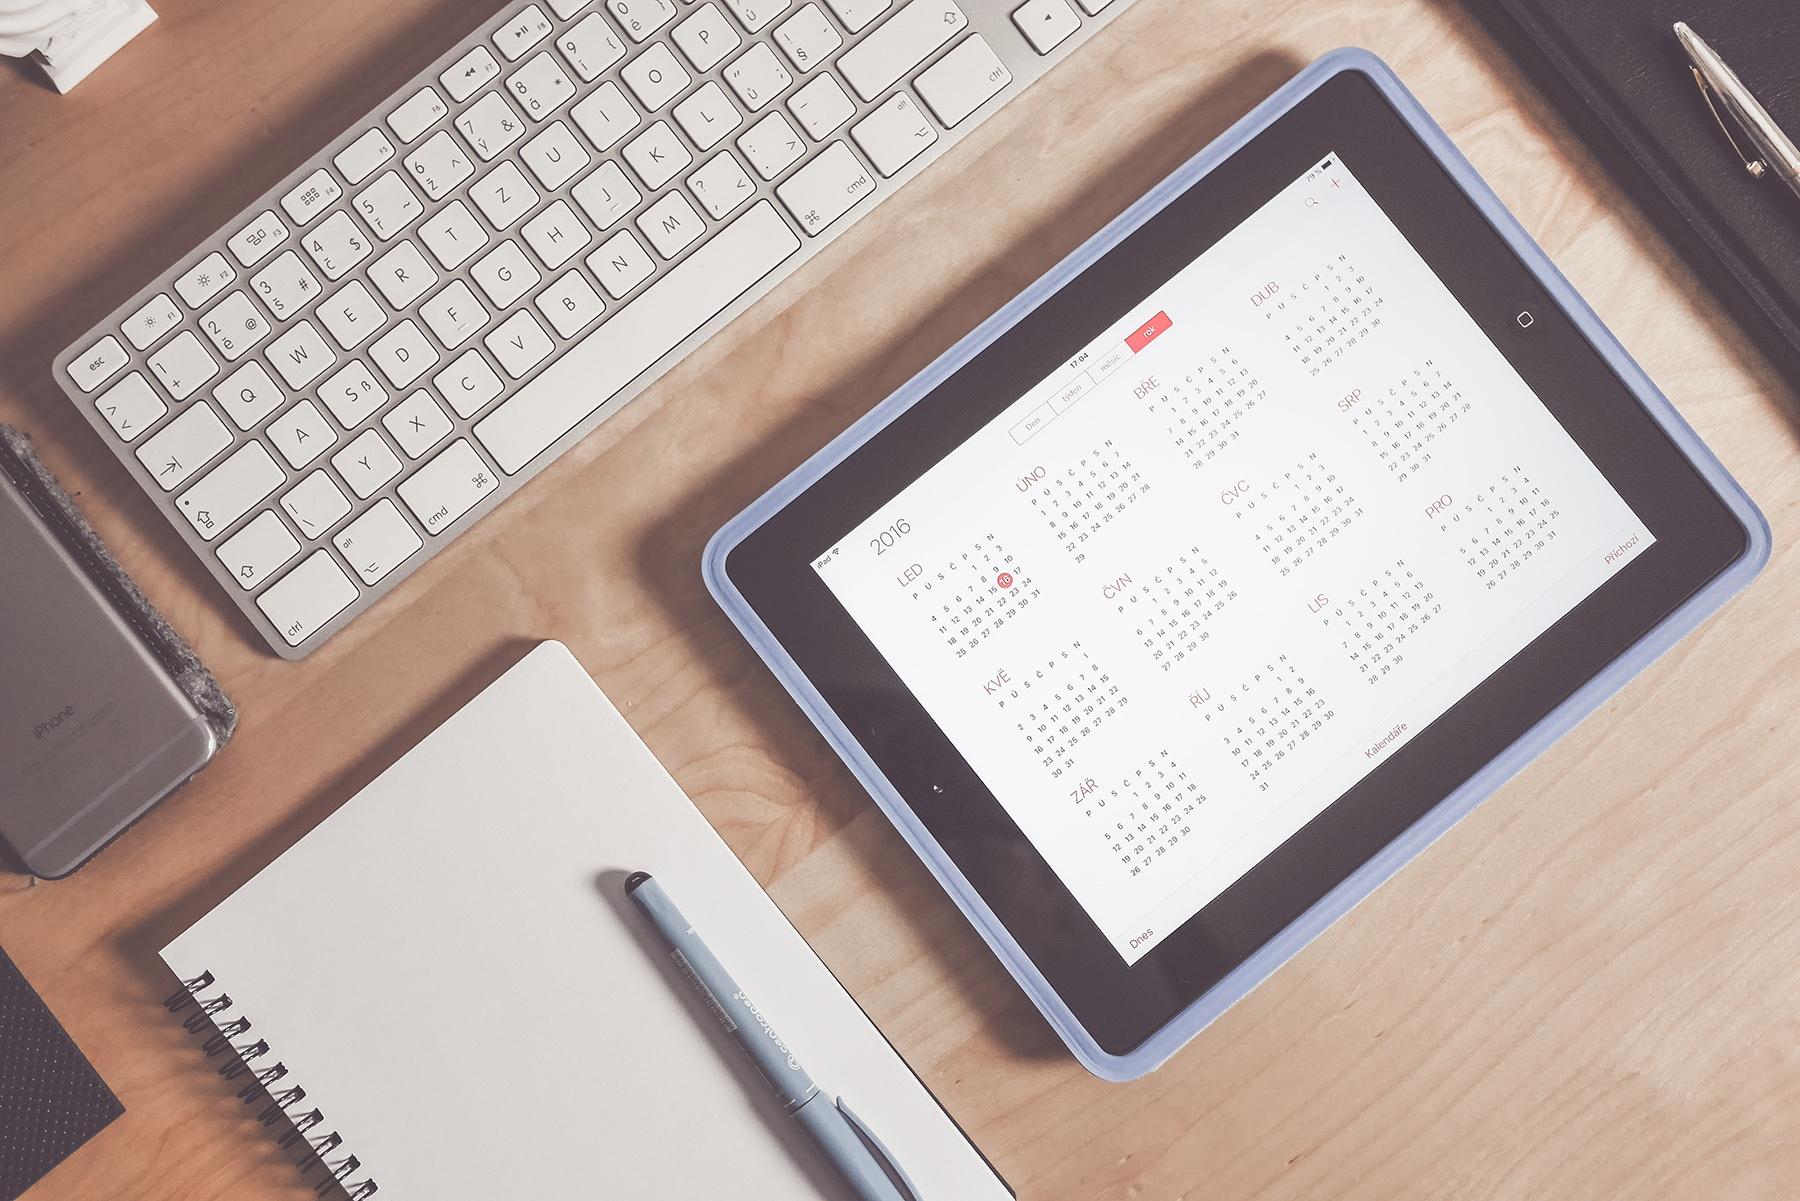 calendar-app-business-time-management-workspace-picjumbo-com